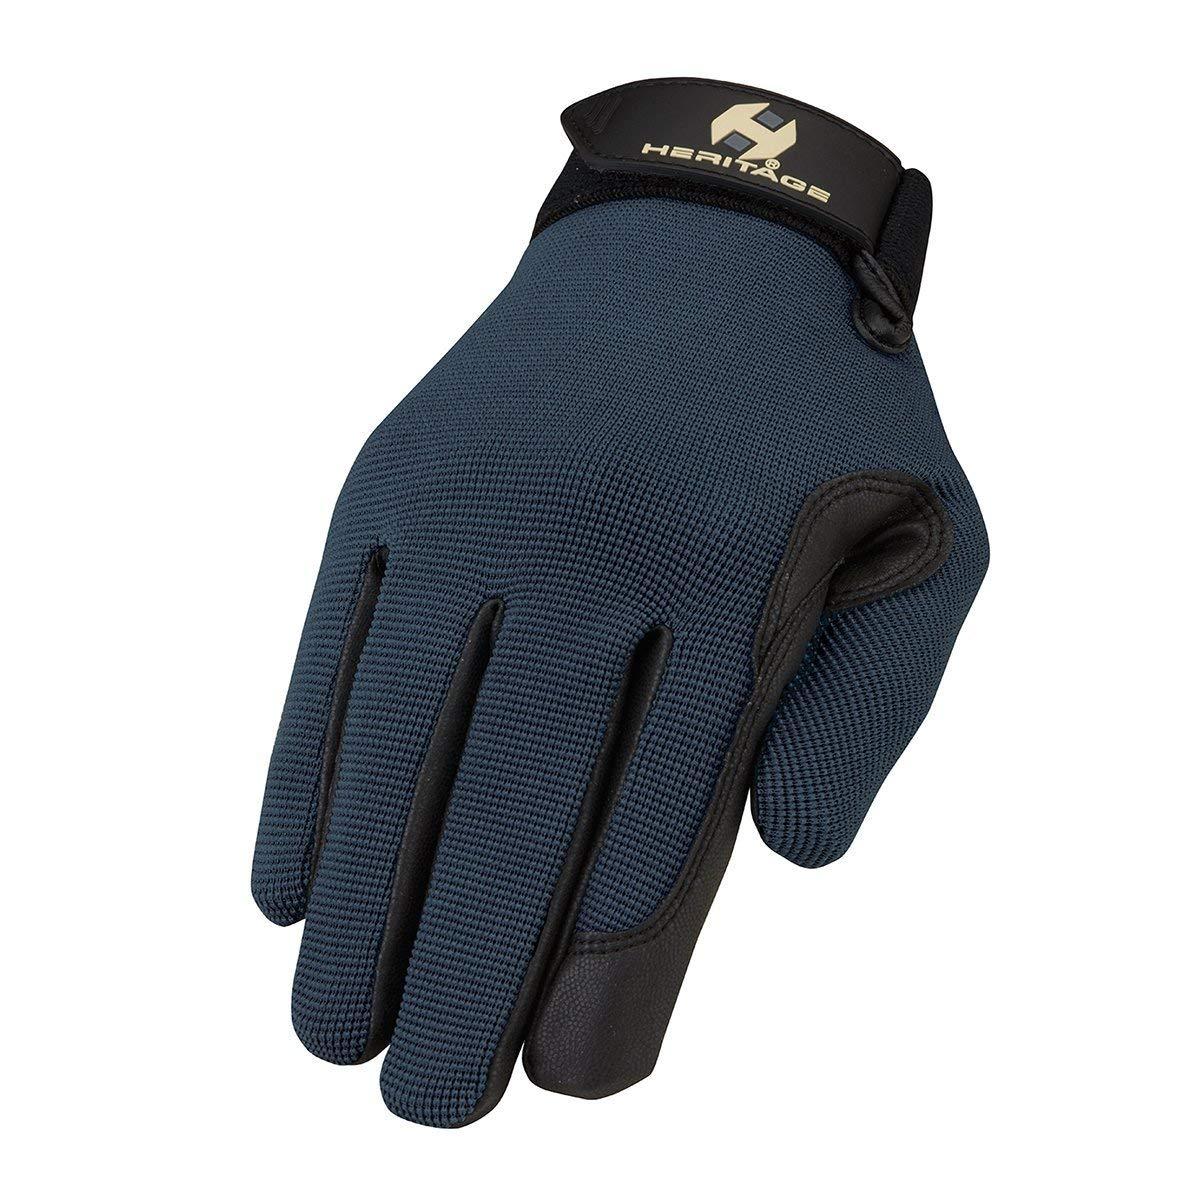 Heritage Performance Gloves Heritage Performance Gloves Heritage Performance Gloves Heritage Performance Gloves Heritage Performance Gloves Heritage Performance Gloves Heritage Performance Gloves